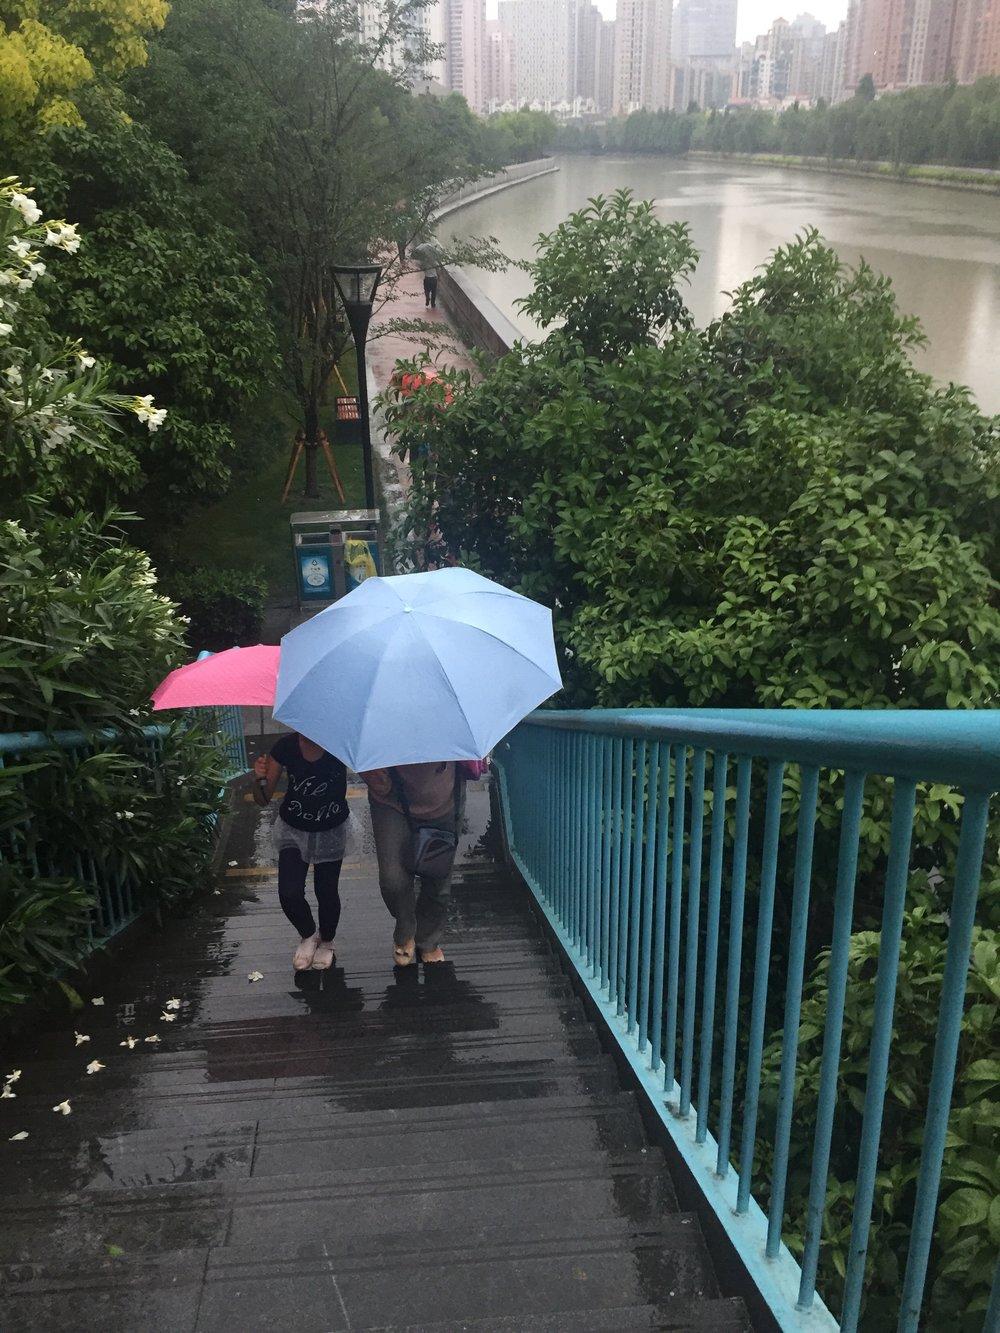 Rainy walk after work.